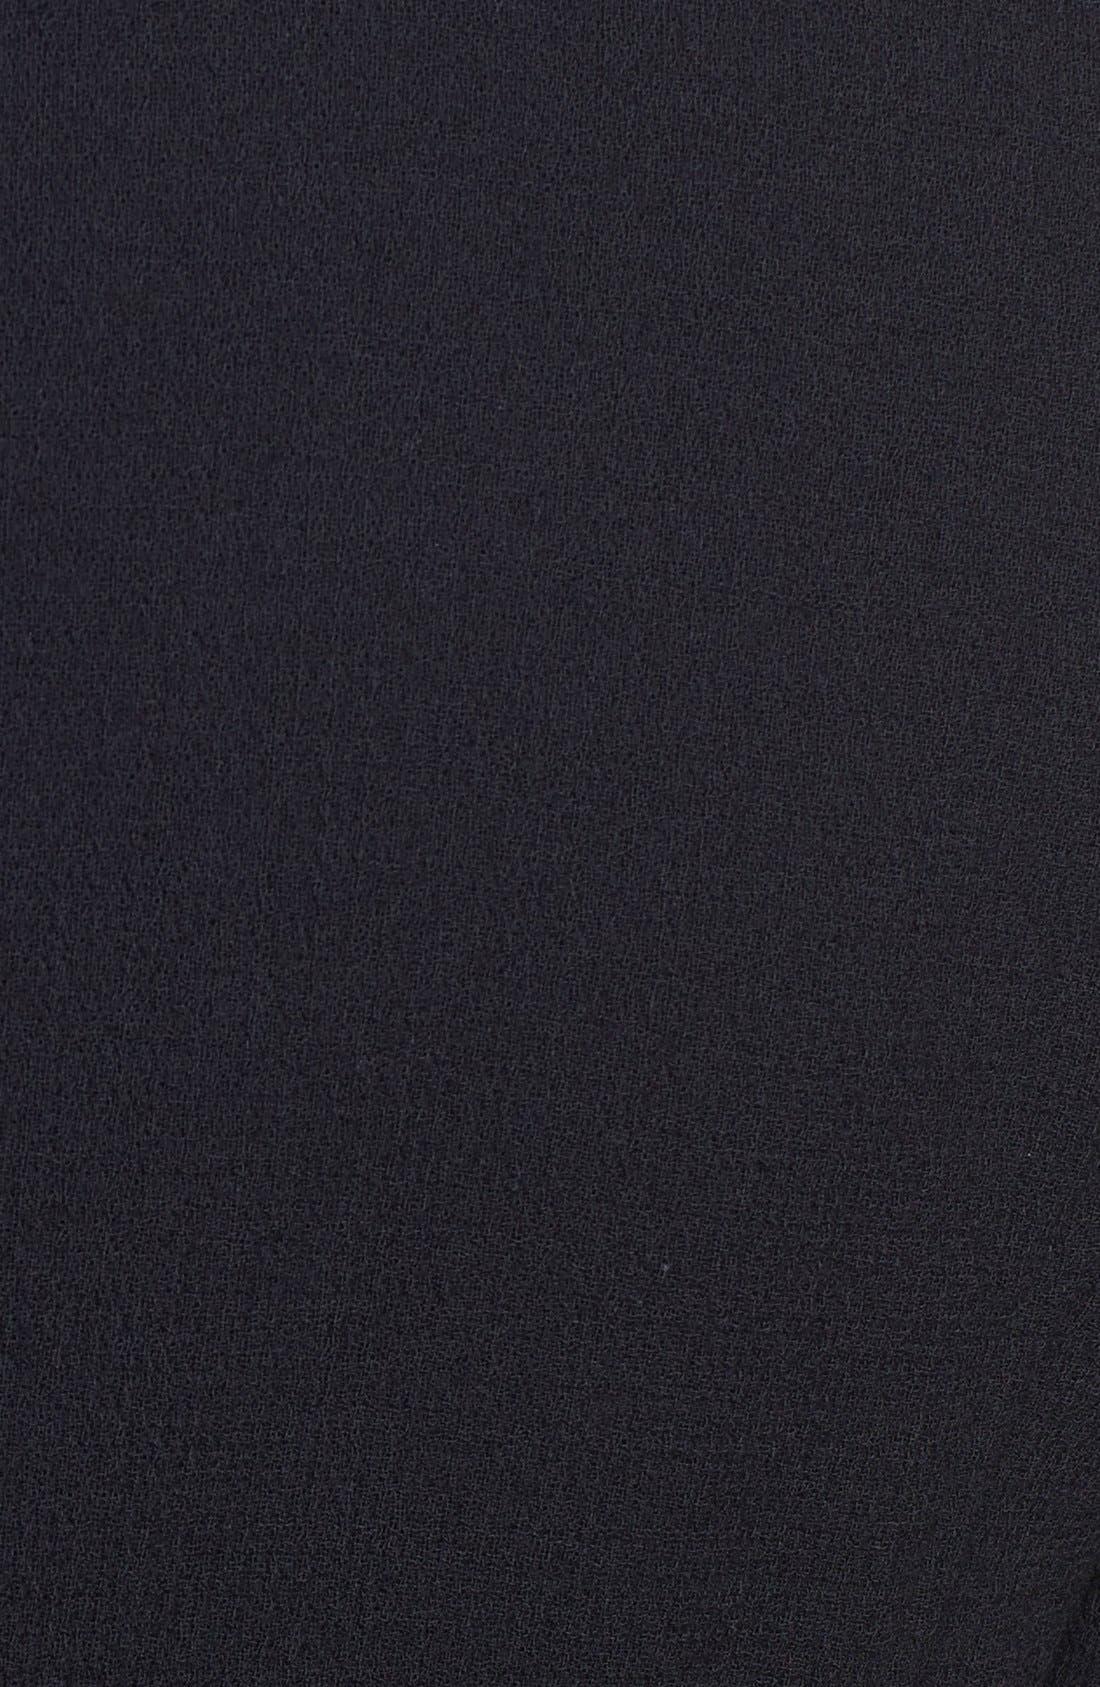 Alternate Image 3  - Santorelli Wool Panel Car Coat